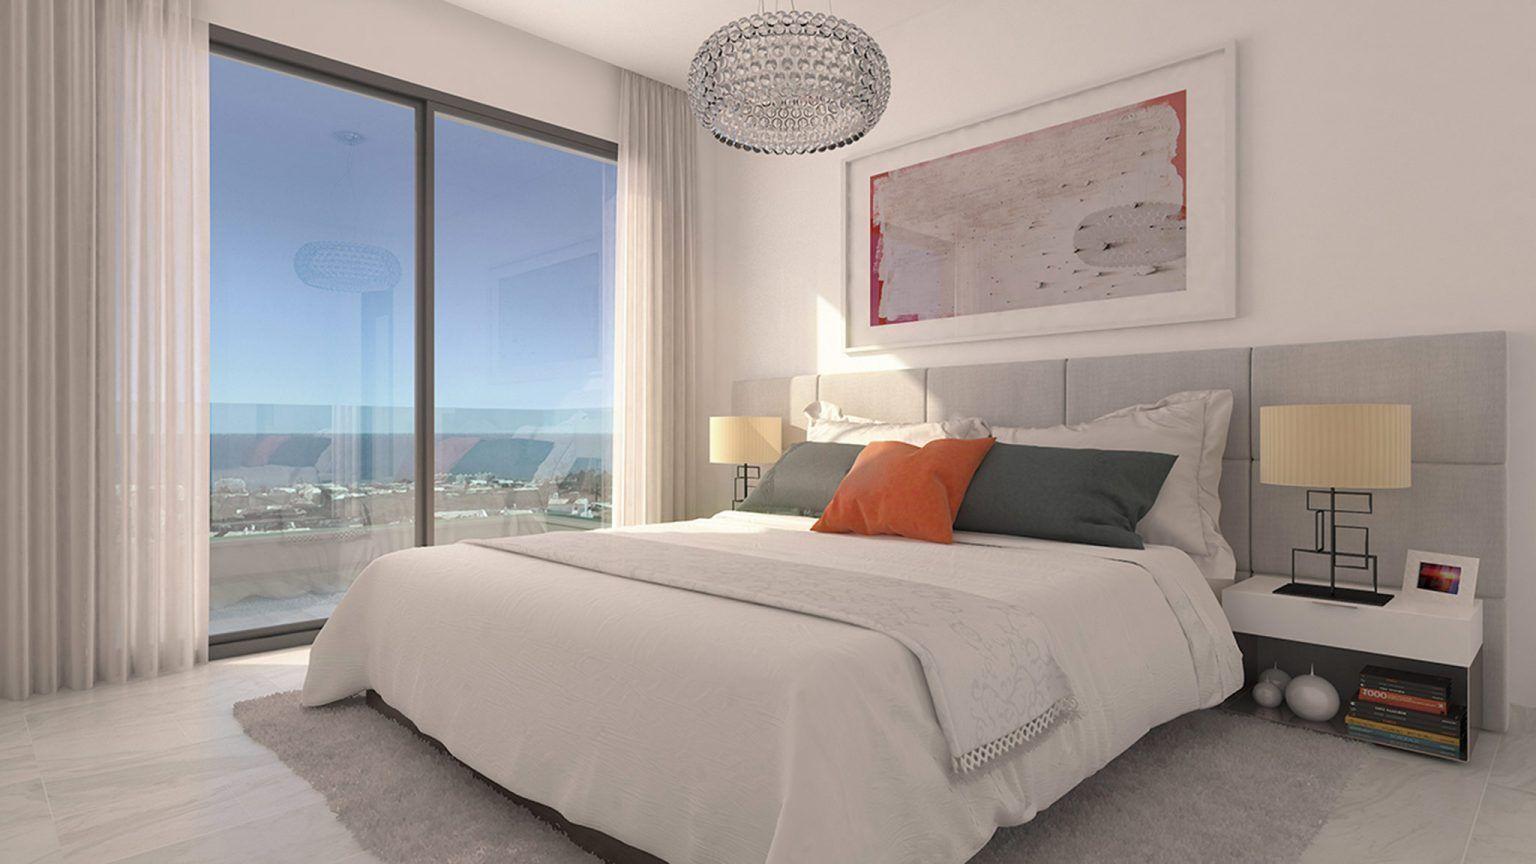 AVS01147-Apartments-canada-02